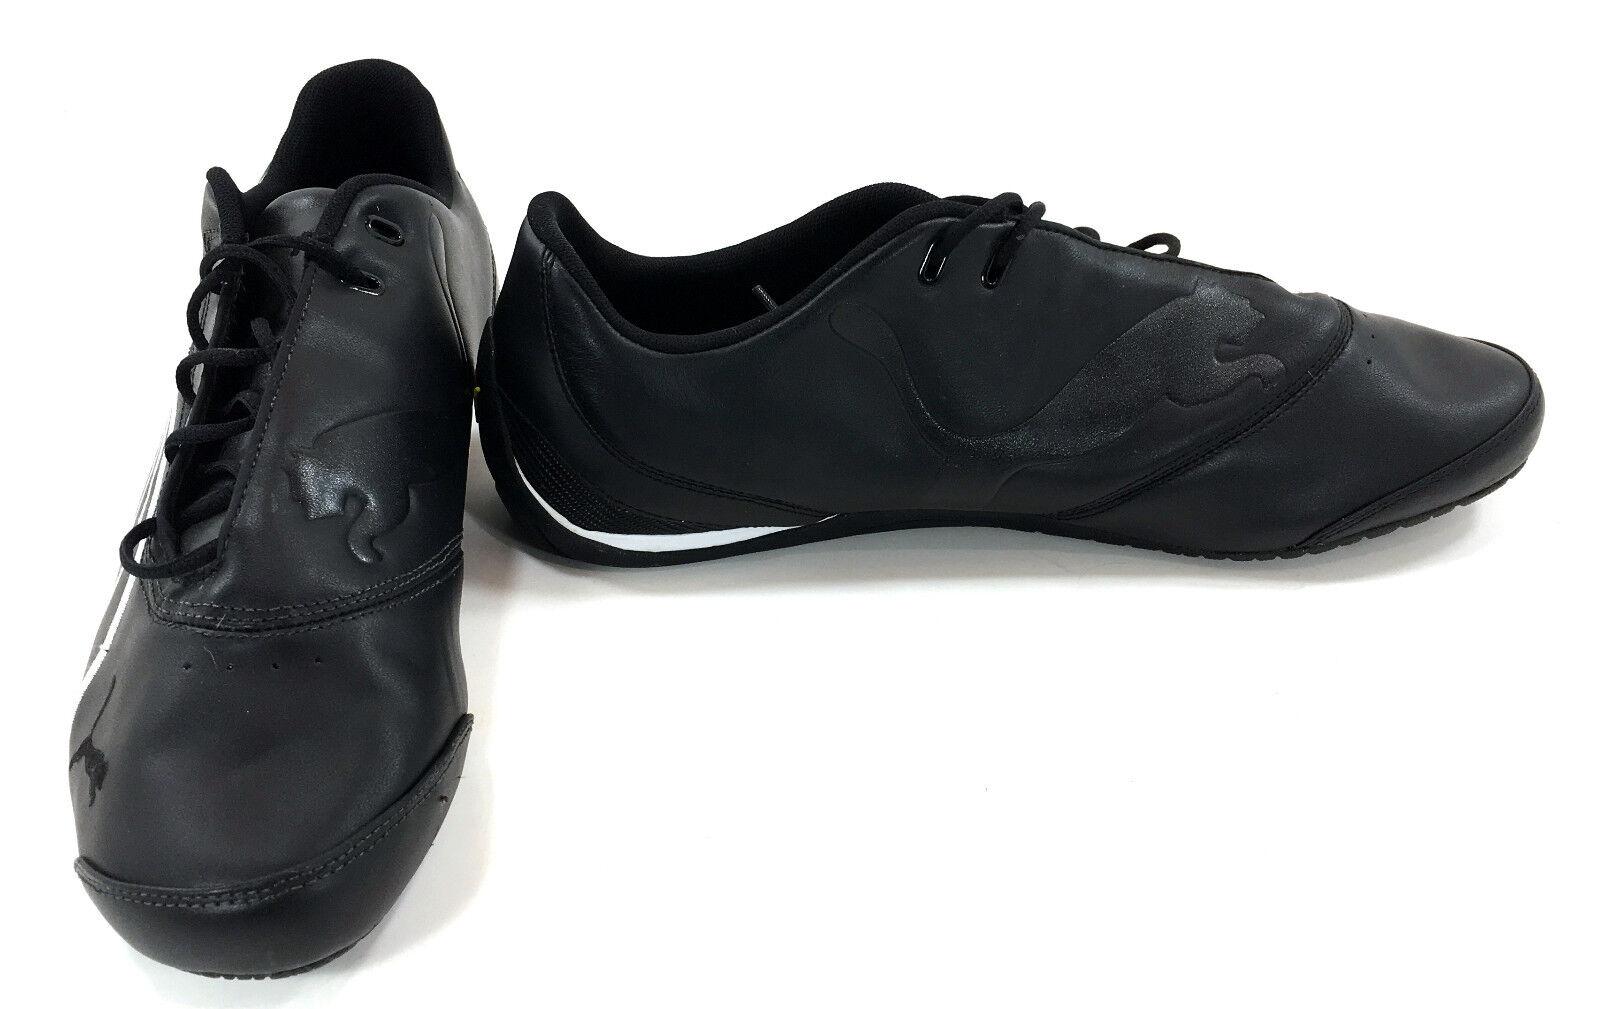 Puma Shoes Drift Cat III 3 SF Ferrari Black/Yellow Sneakers Comfortable